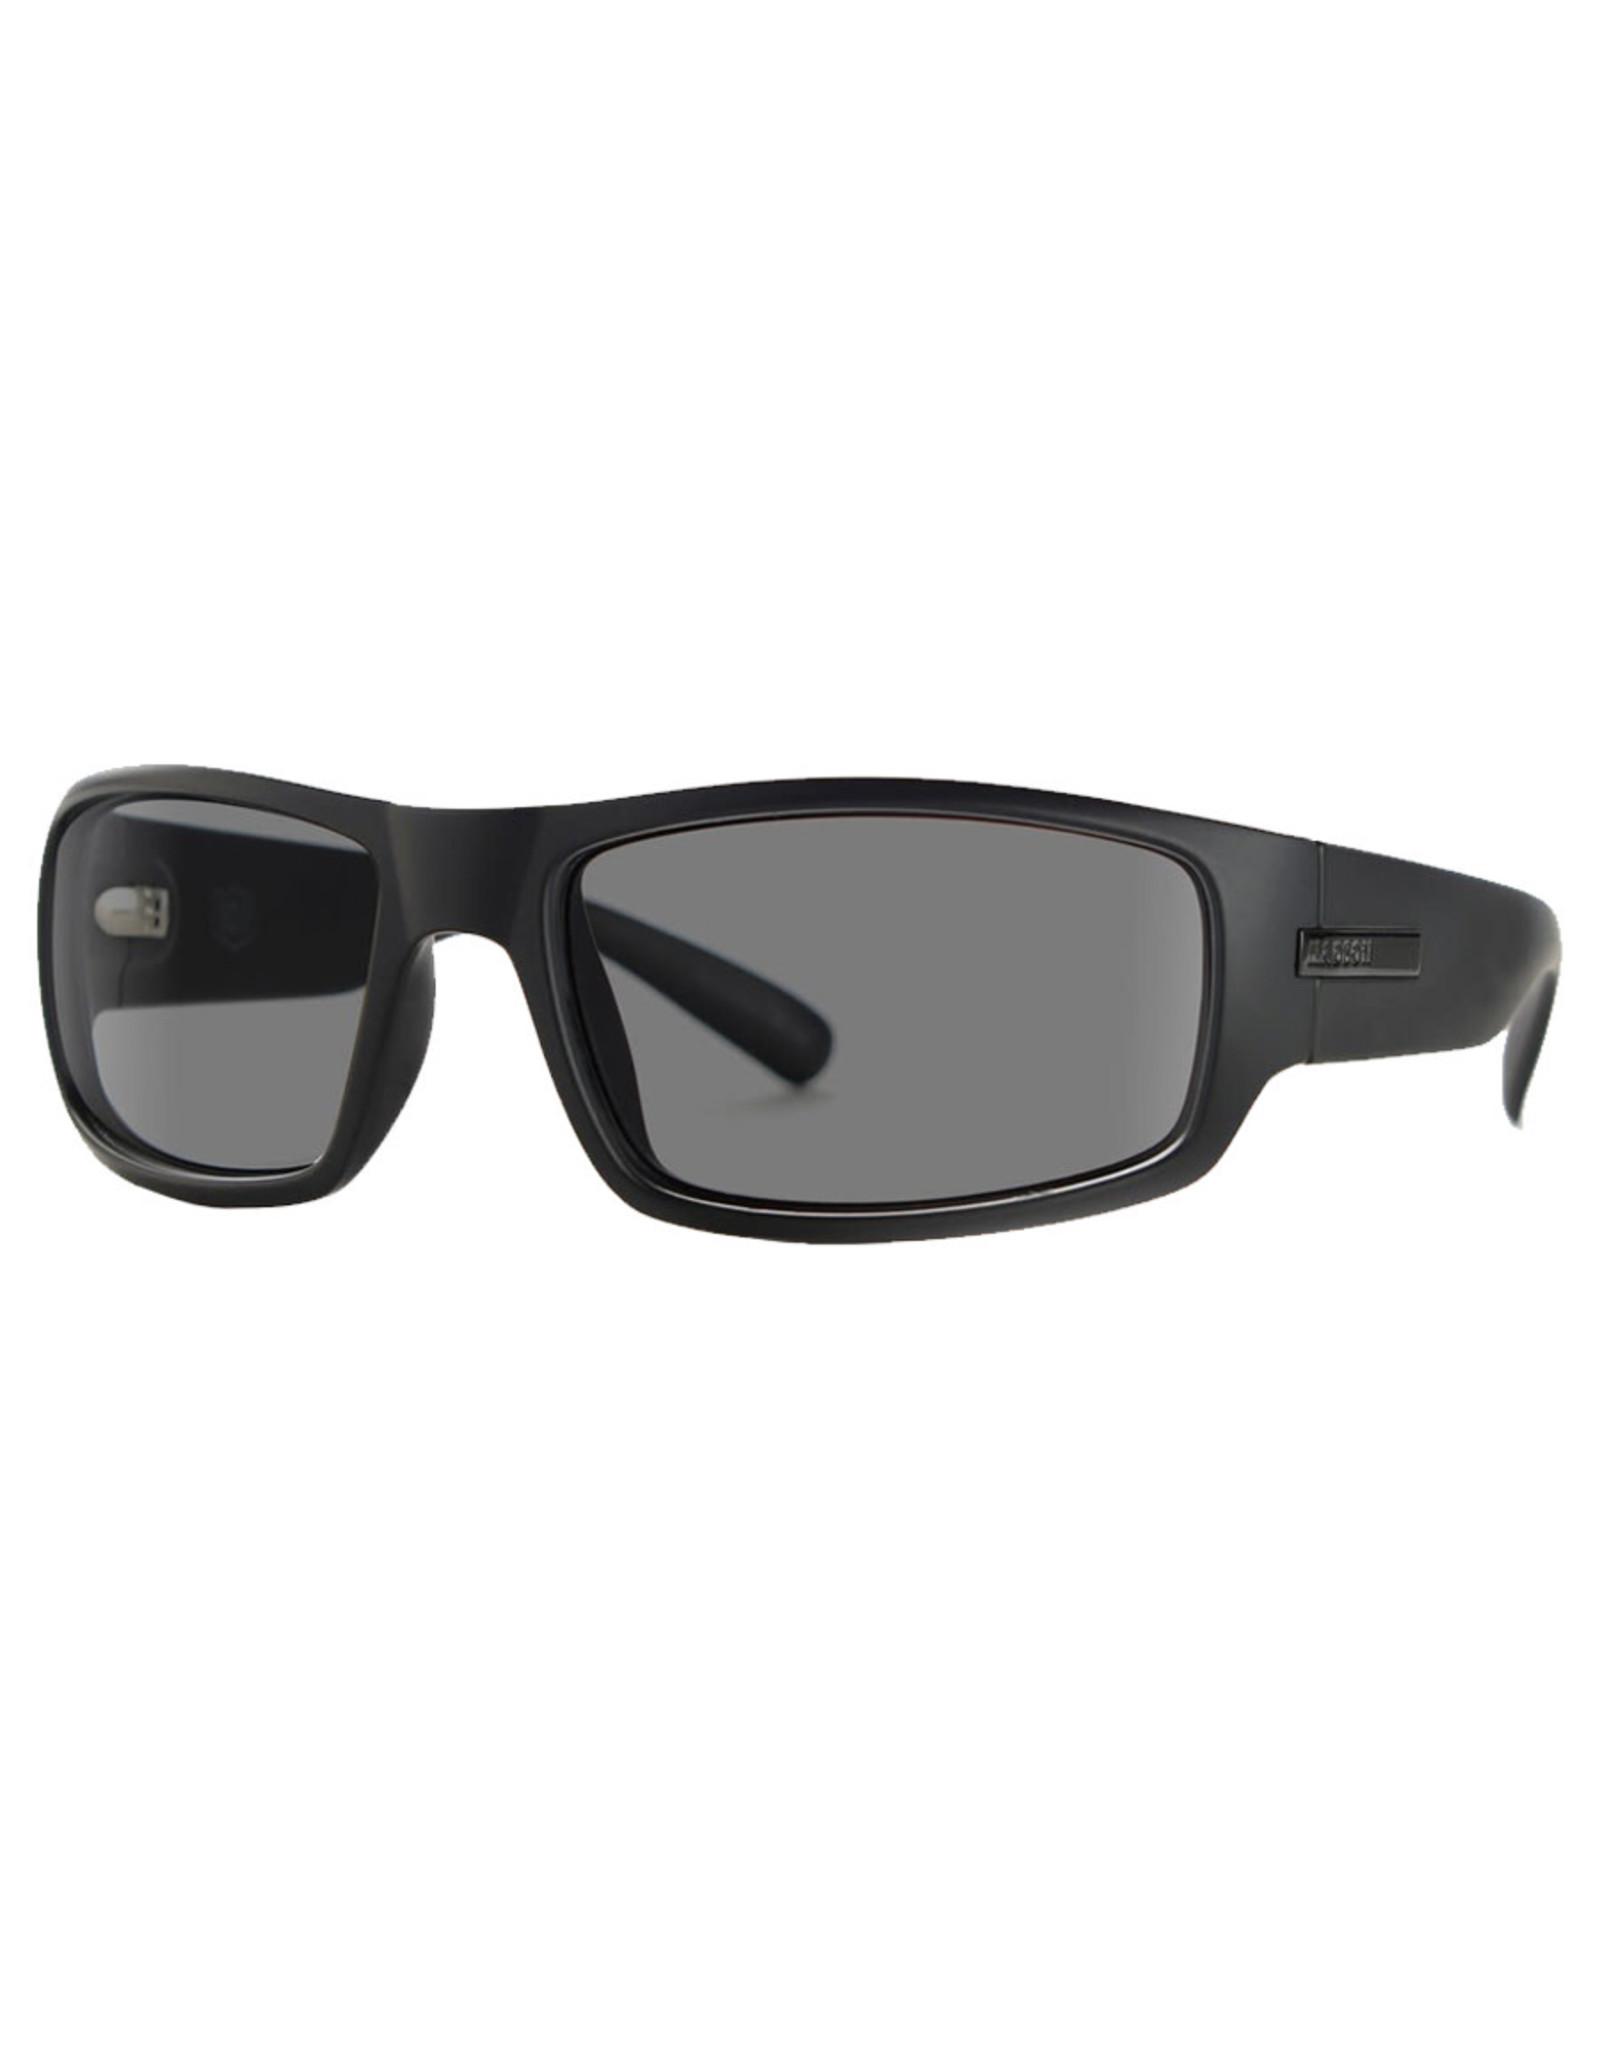 Madson Madson Sunglasses 101 (Black on Black/Grey Polarized Lens)